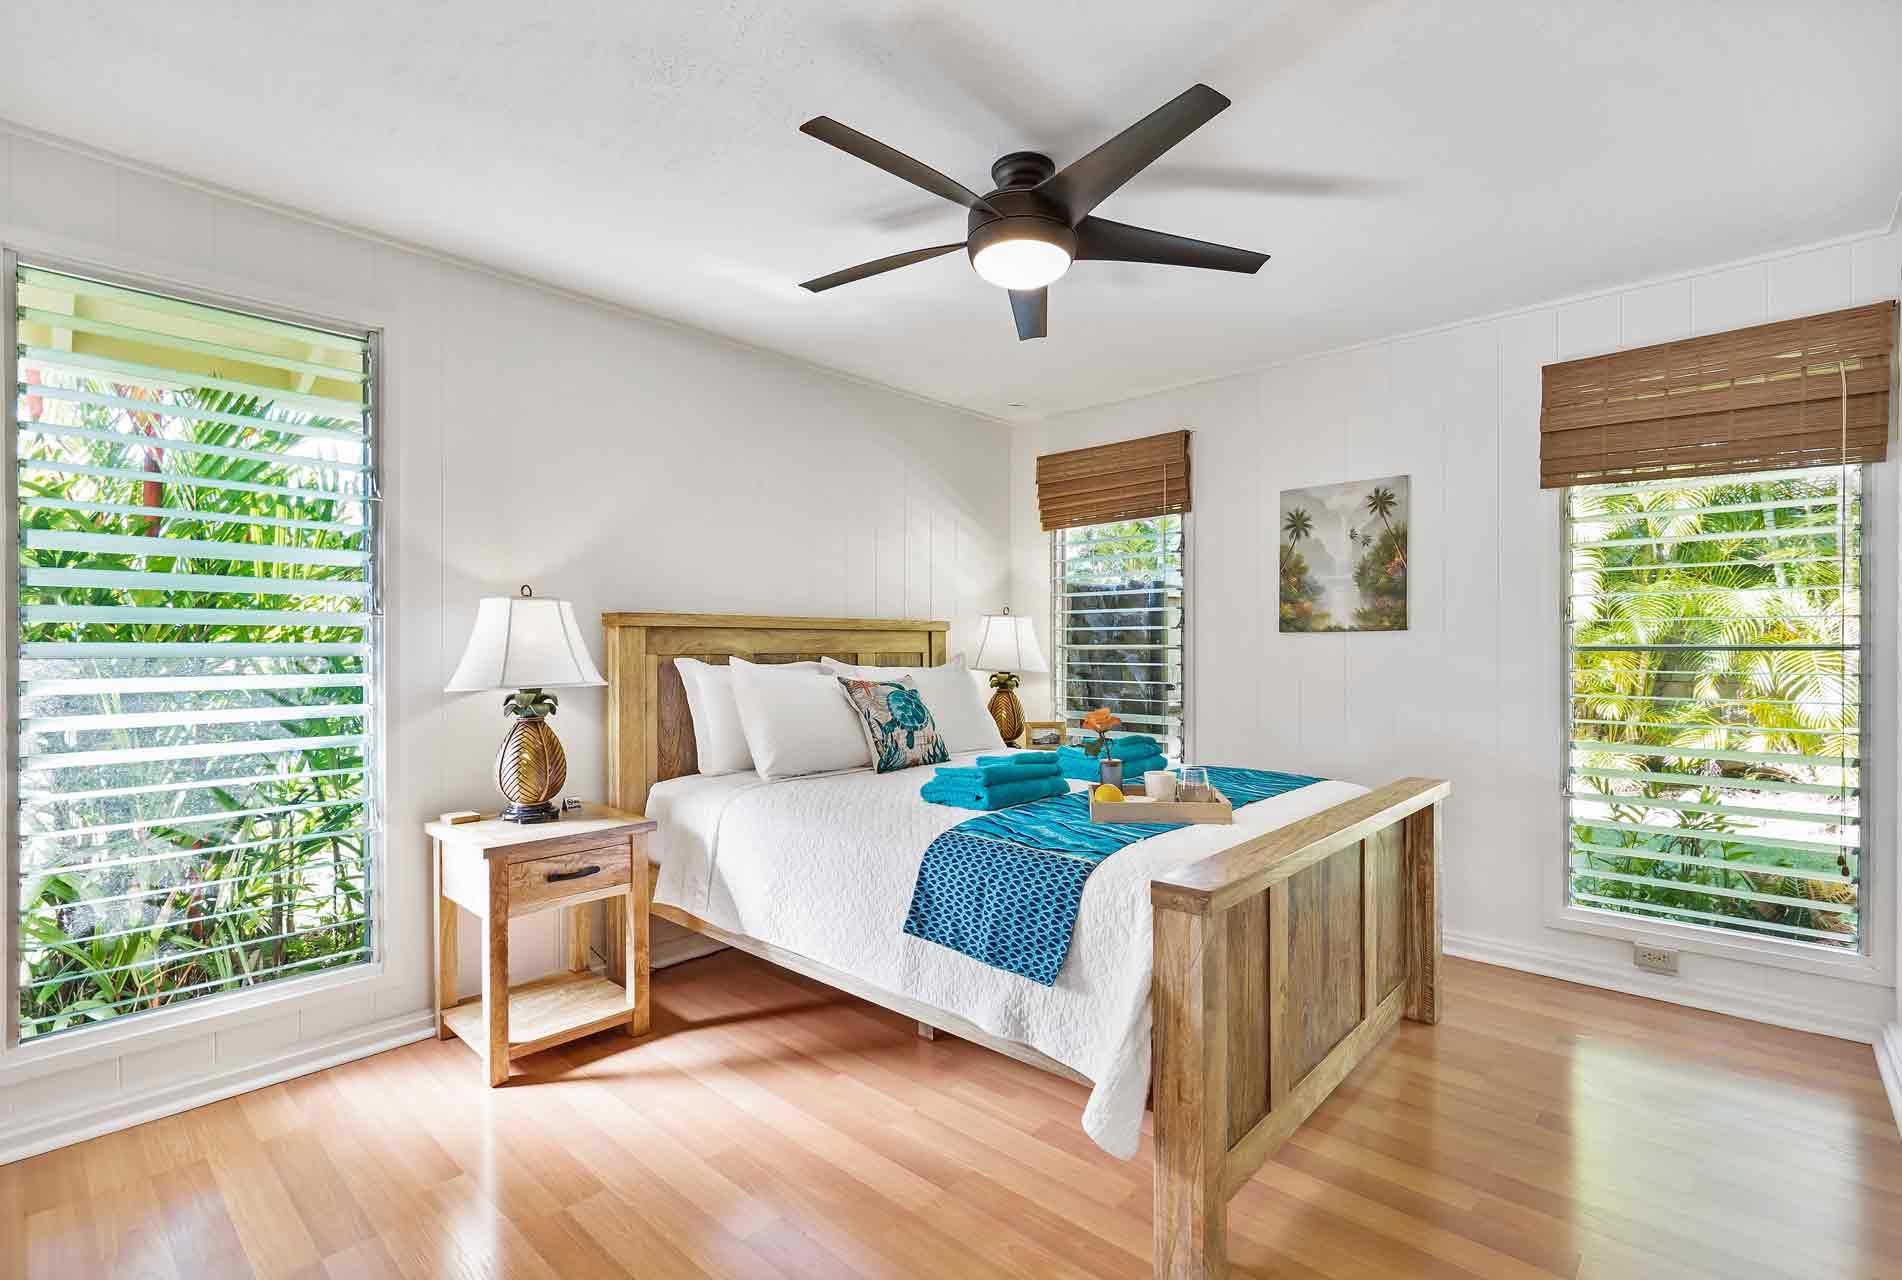 5 Examples of Major Home Repairs